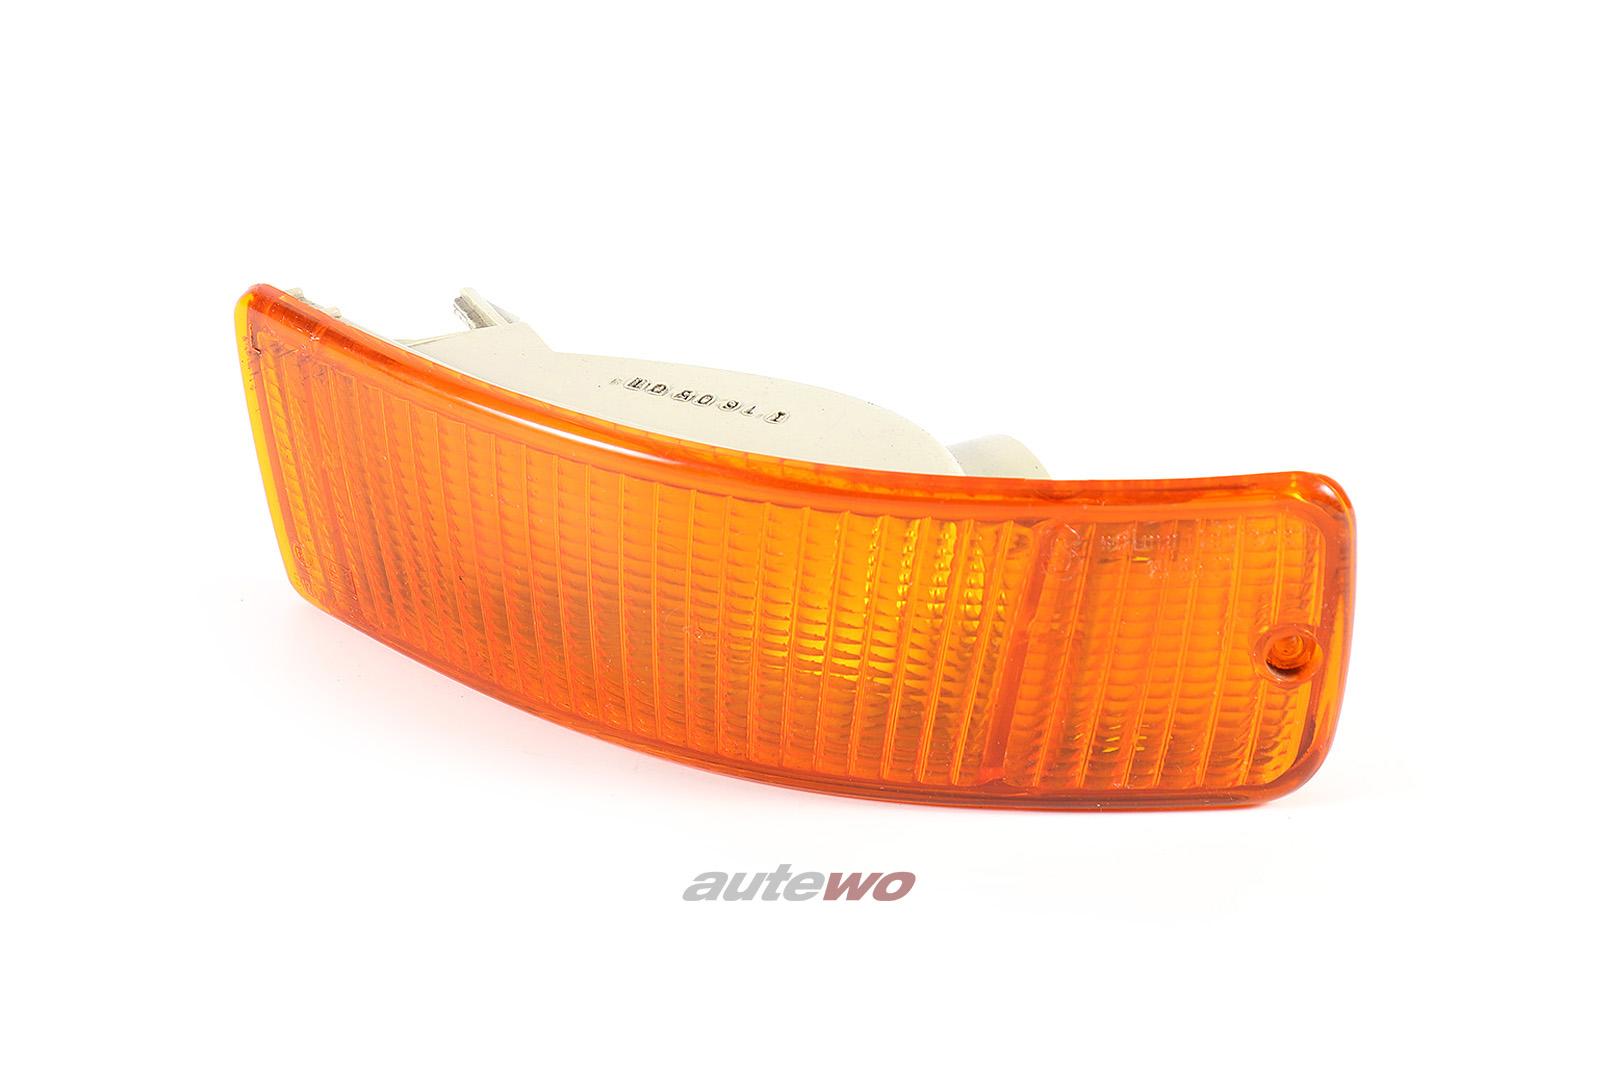 8A0953049A Audi 80 B4/Coupe/Cabrio Typ 89/S2 Blinker Vorne Links orange